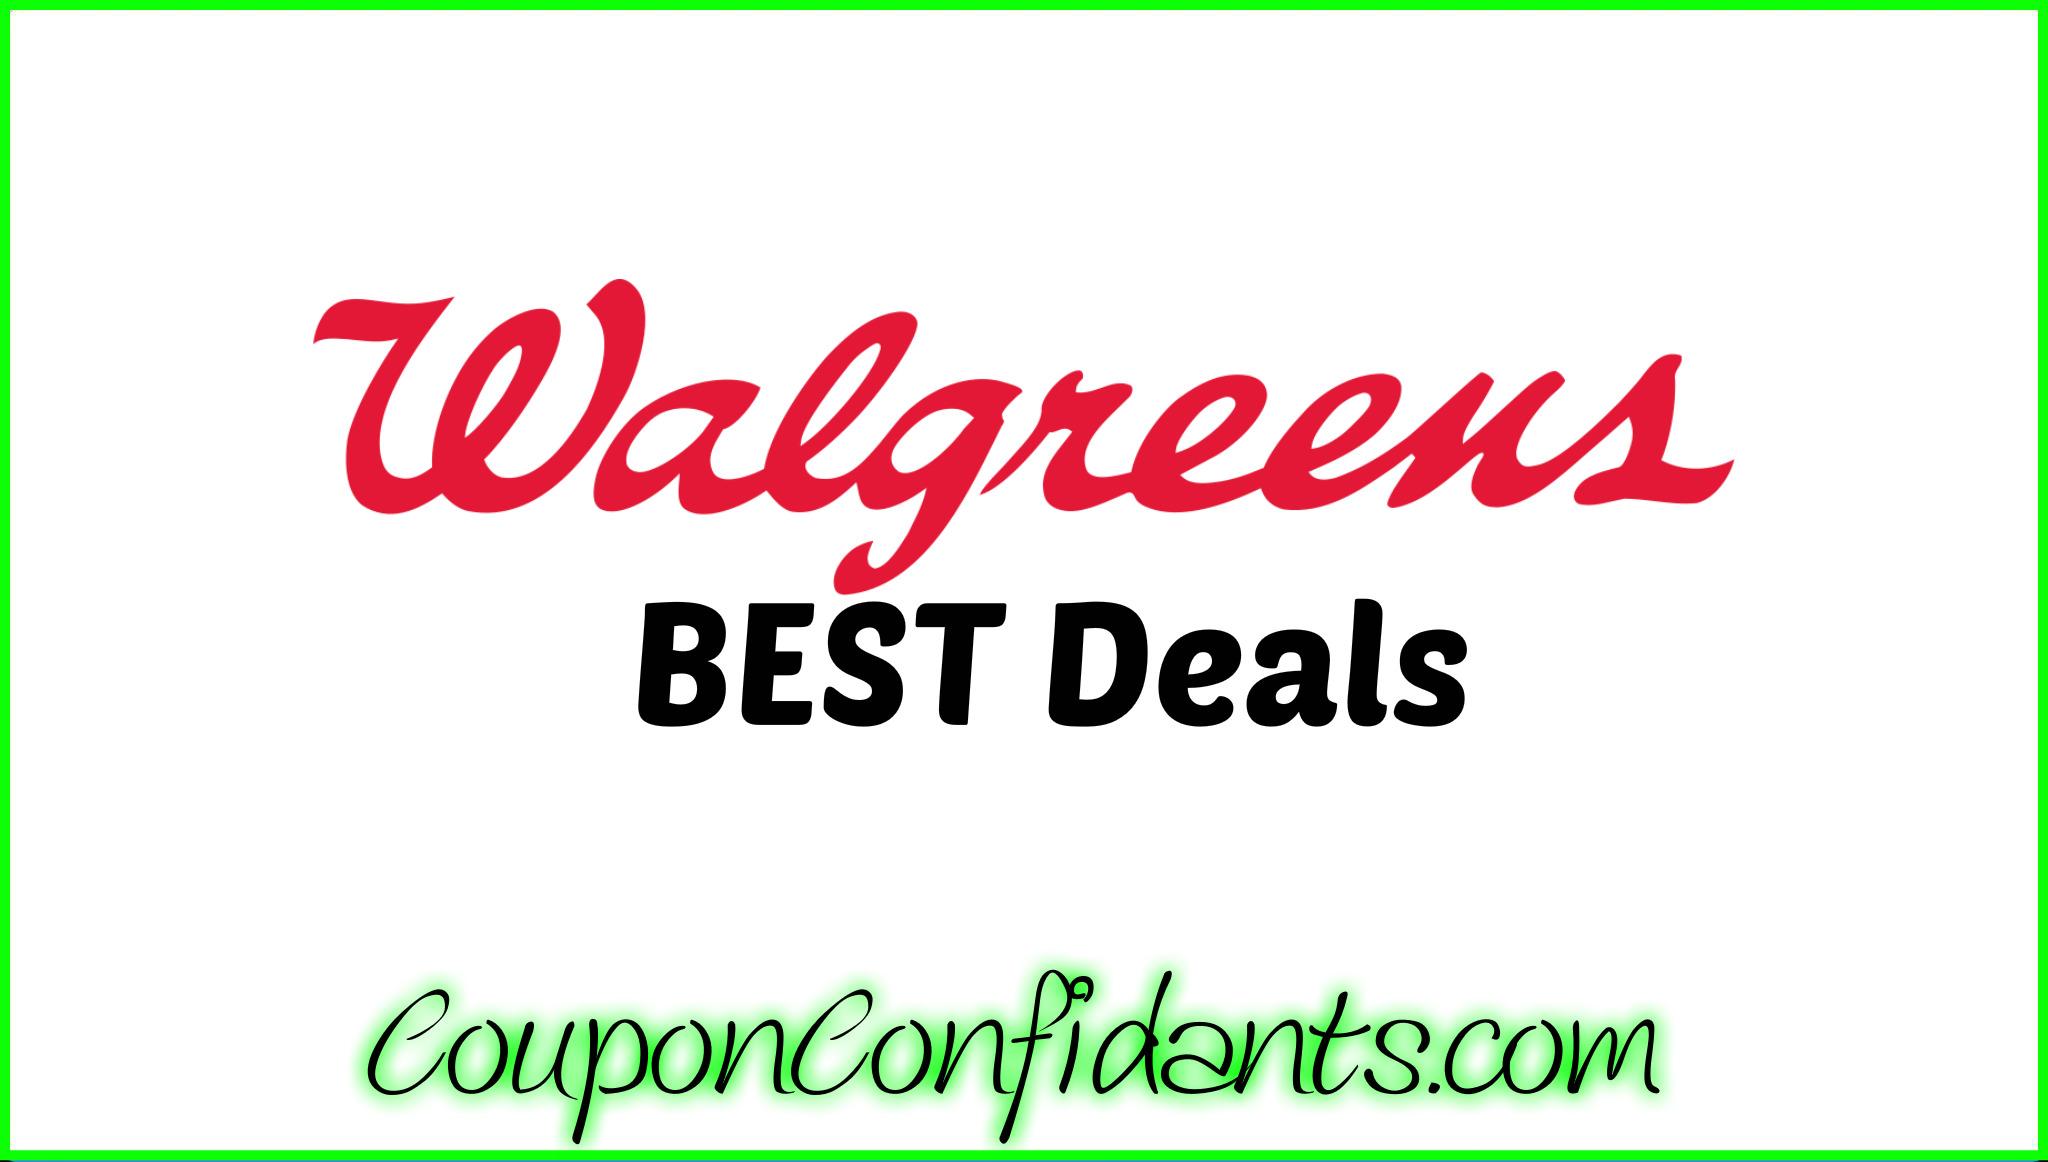 Walgreens - Mar 18 - 24